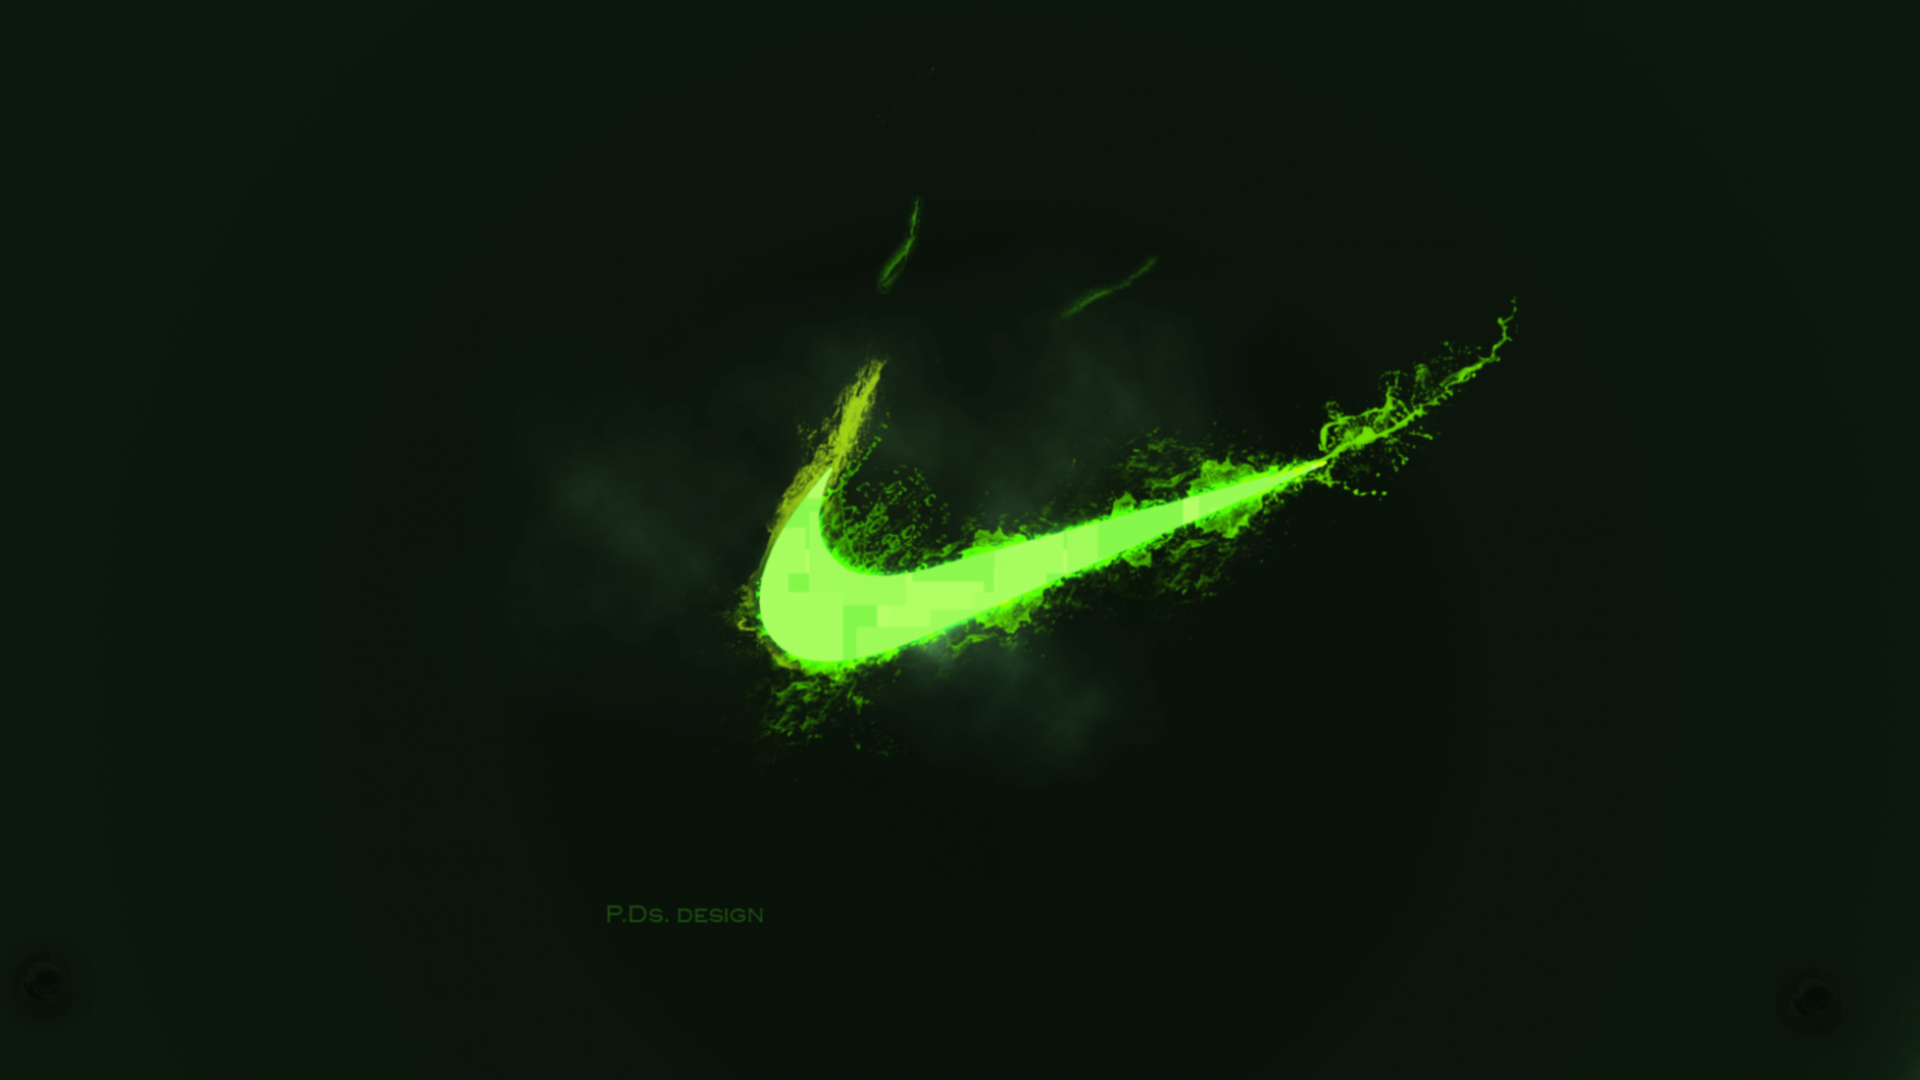 Free Download Cool Nike Wallpaper Widescreen Hd Wallpapers